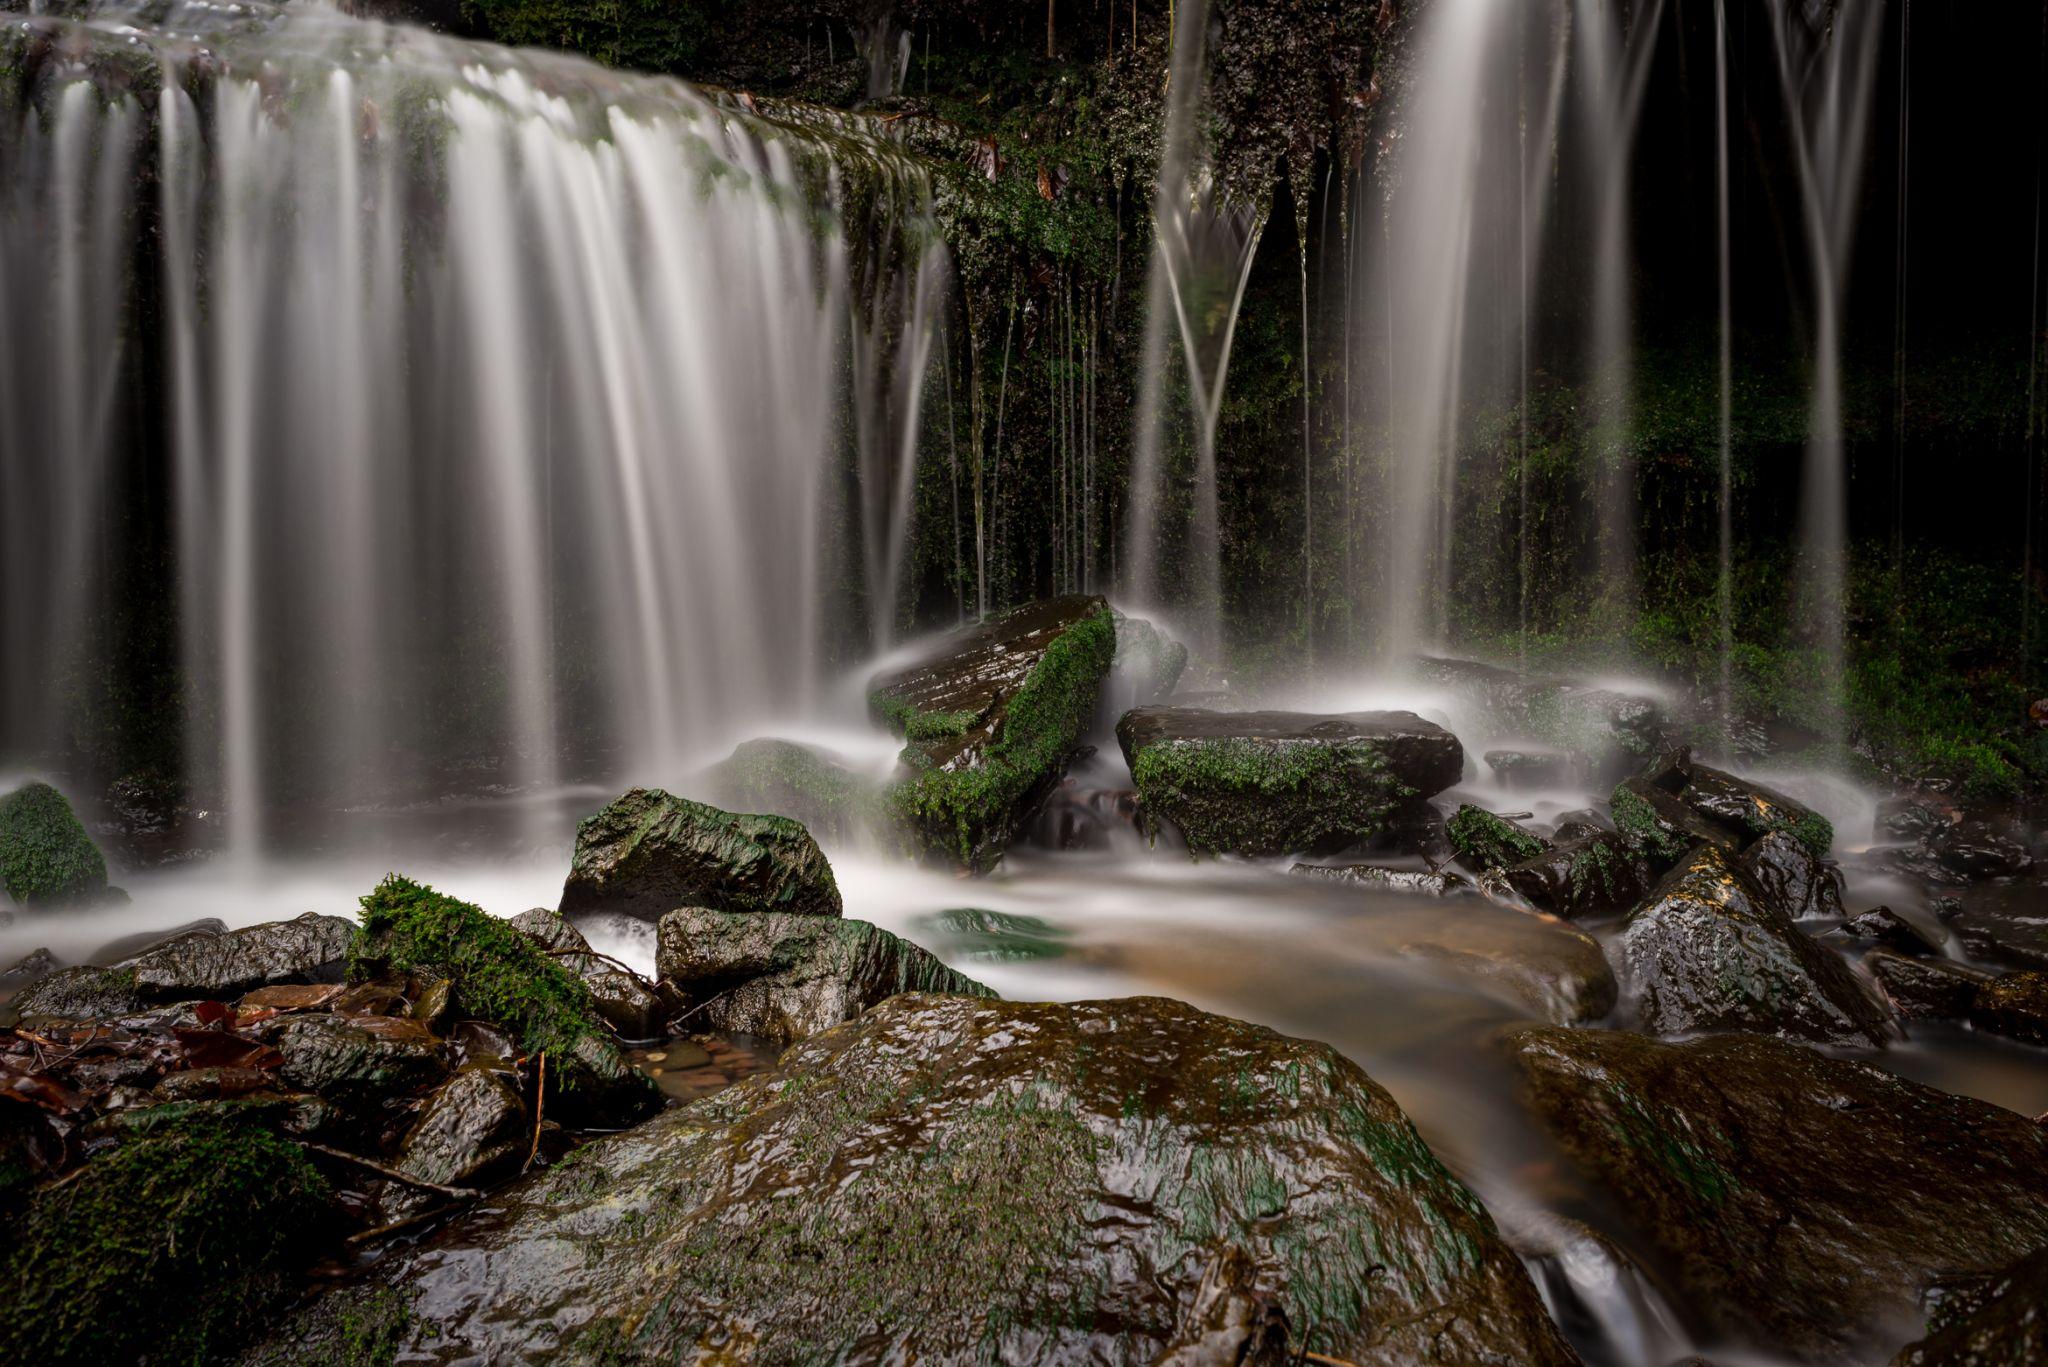 Heslacher Waterfall, Germany